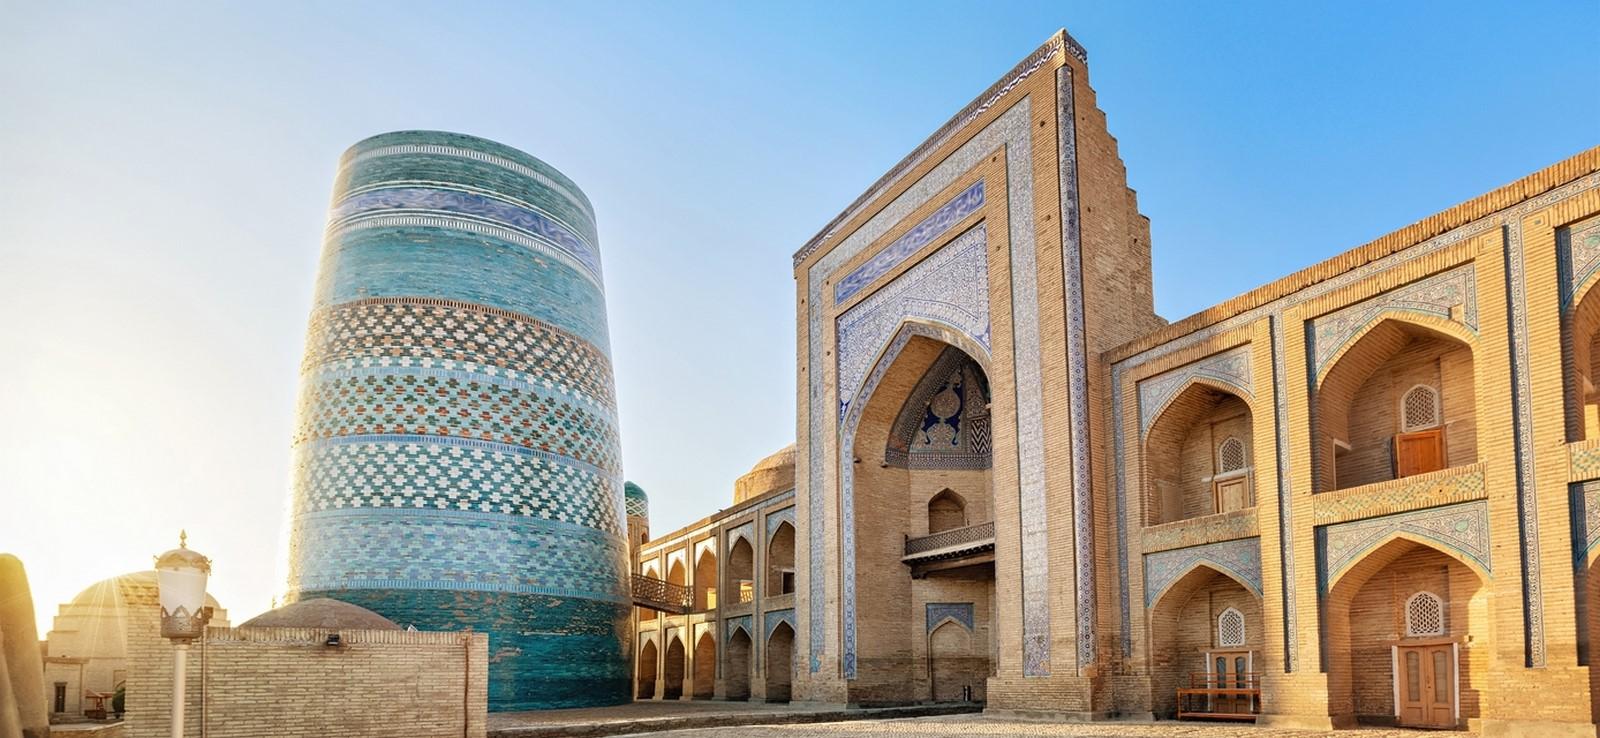 Walled city of Khiva/Ichan Kala - Sheet1